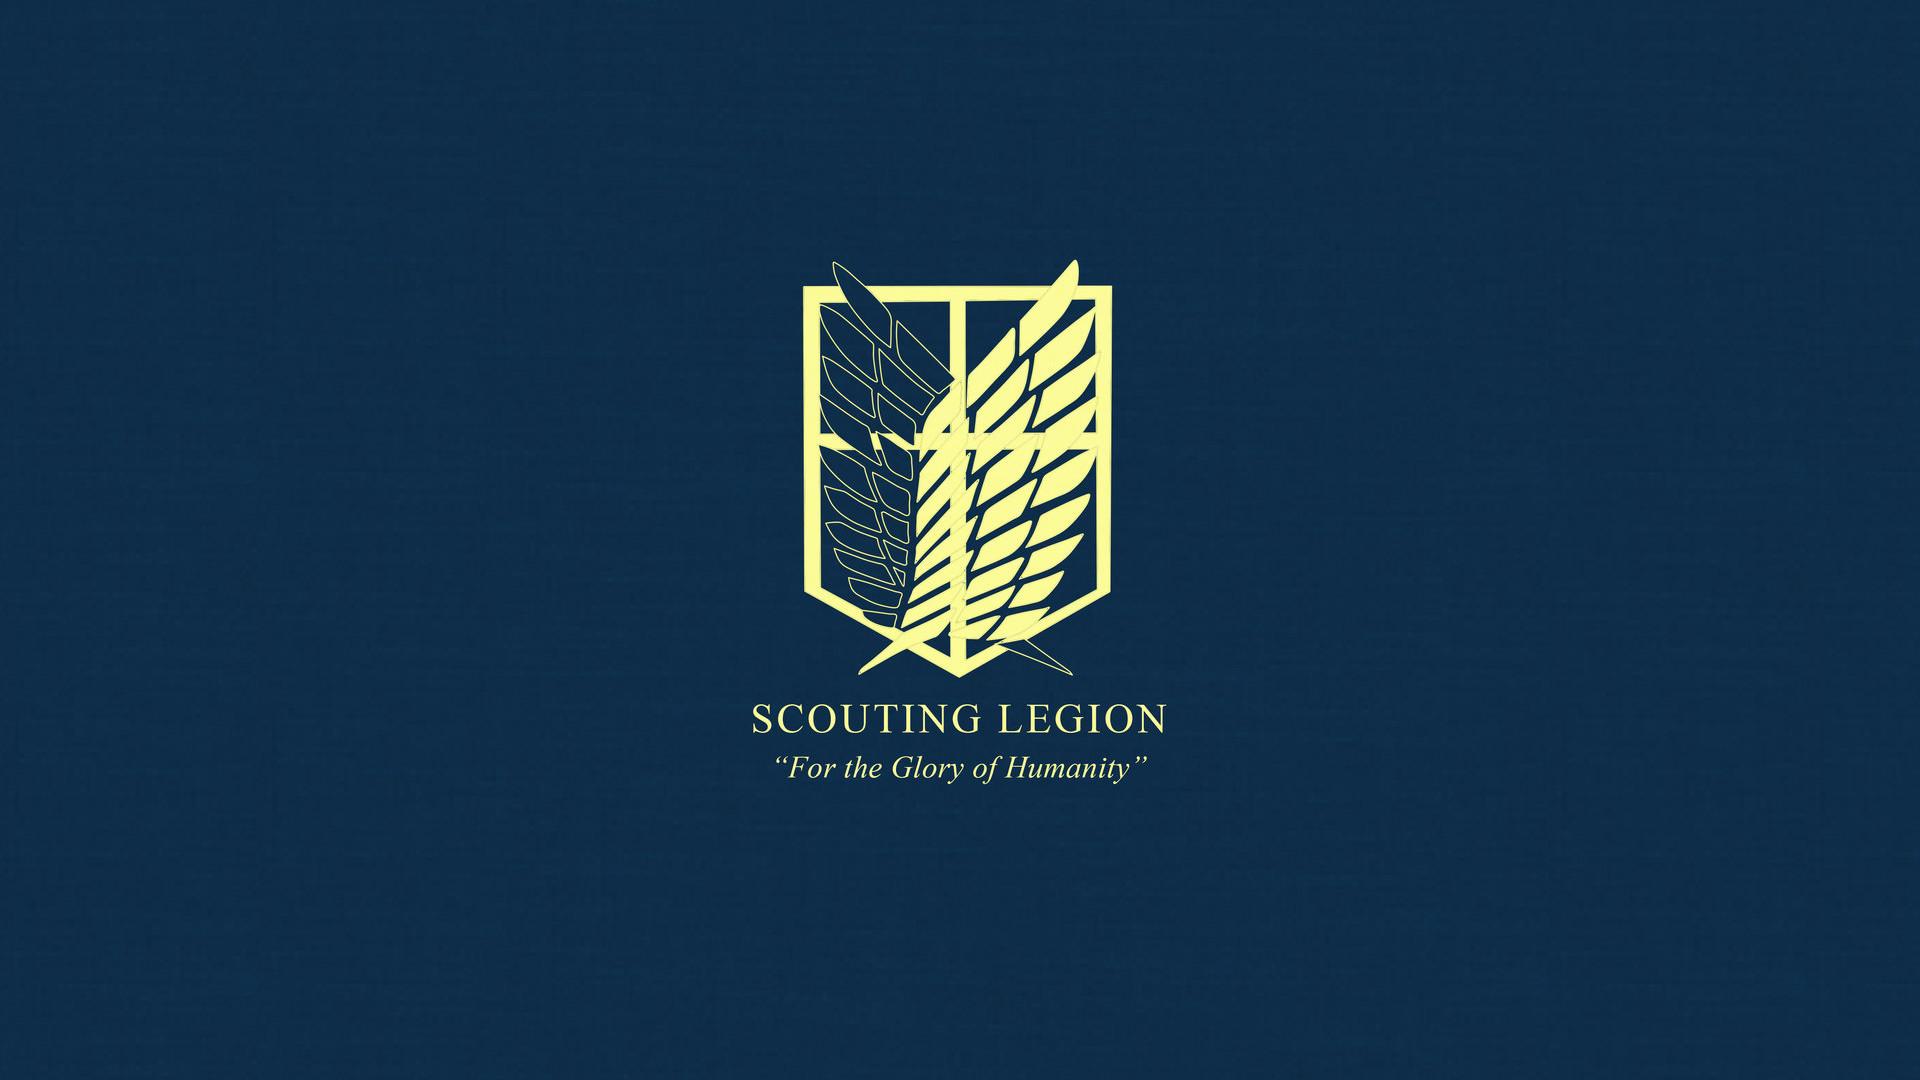 … Attack on Titan: Scouting Legion Wallpaper by Imxset21